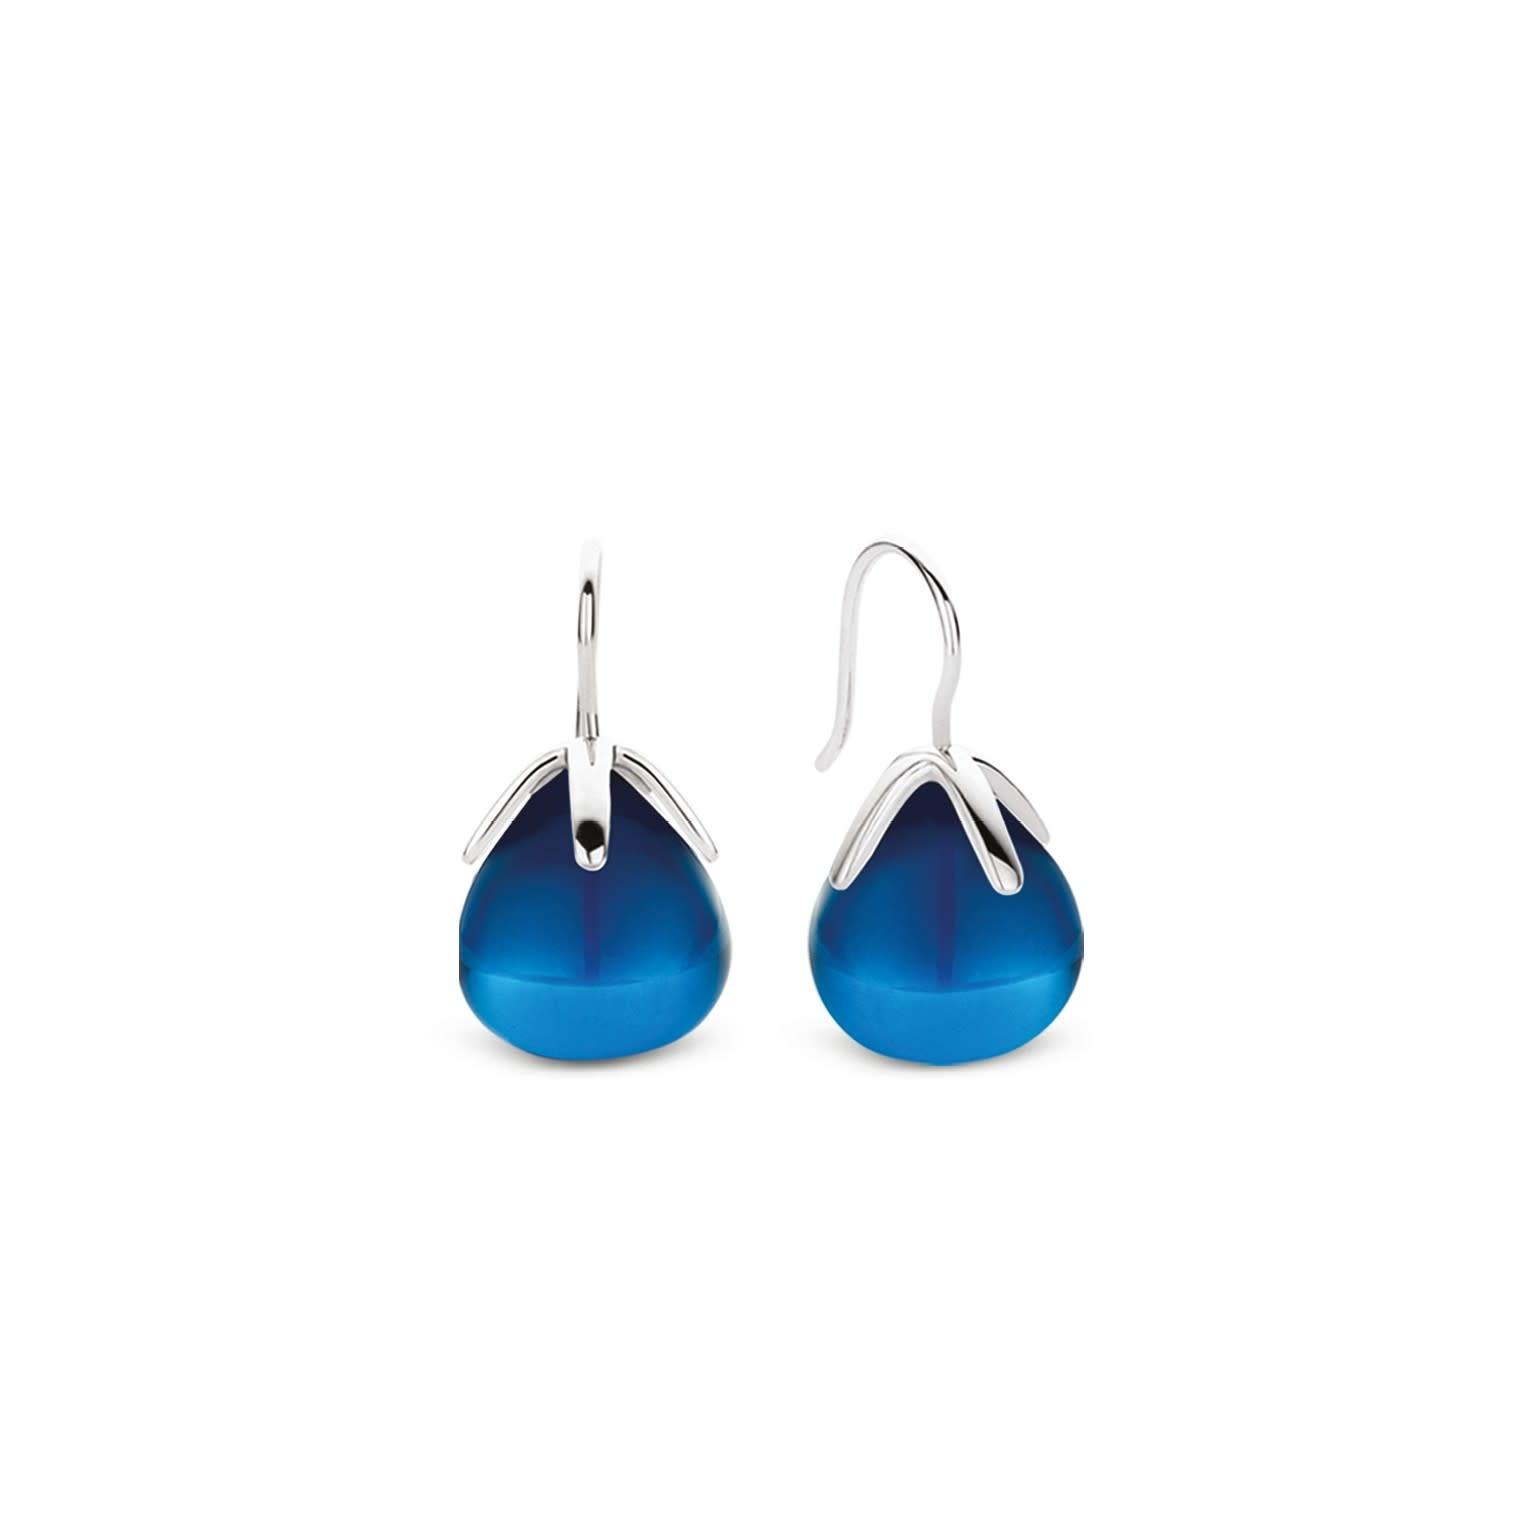 TI SENTO - Milano Earrings 7794DB-1